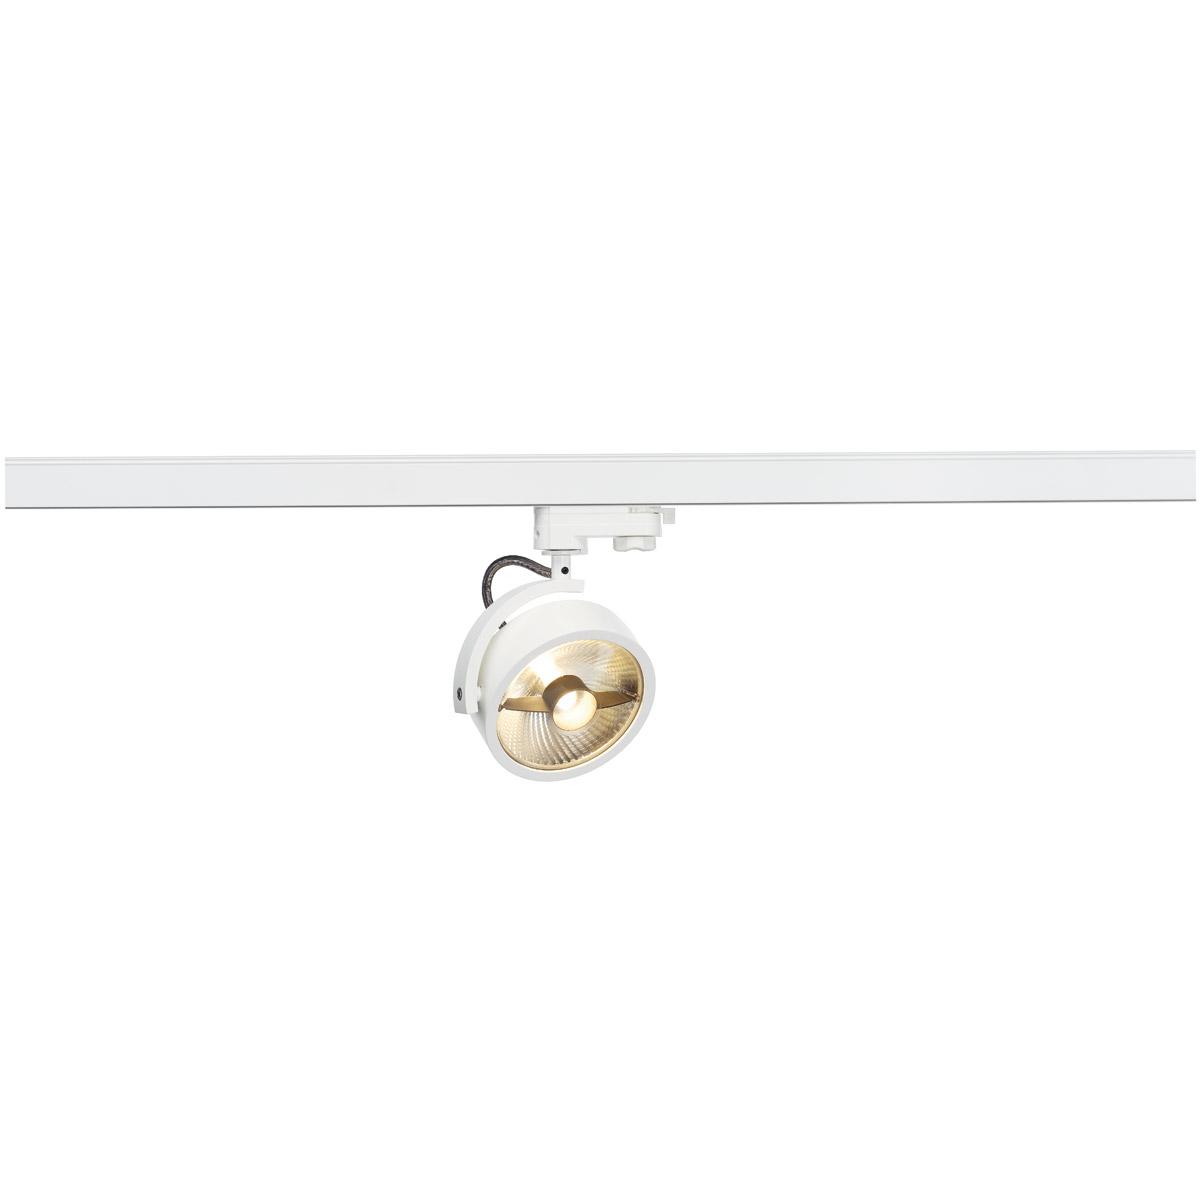 slv 152611 kalu track qpar111 leuchten kopf weiss inkl 3p adapter. Black Bedroom Furniture Sets. Home Design Ideas